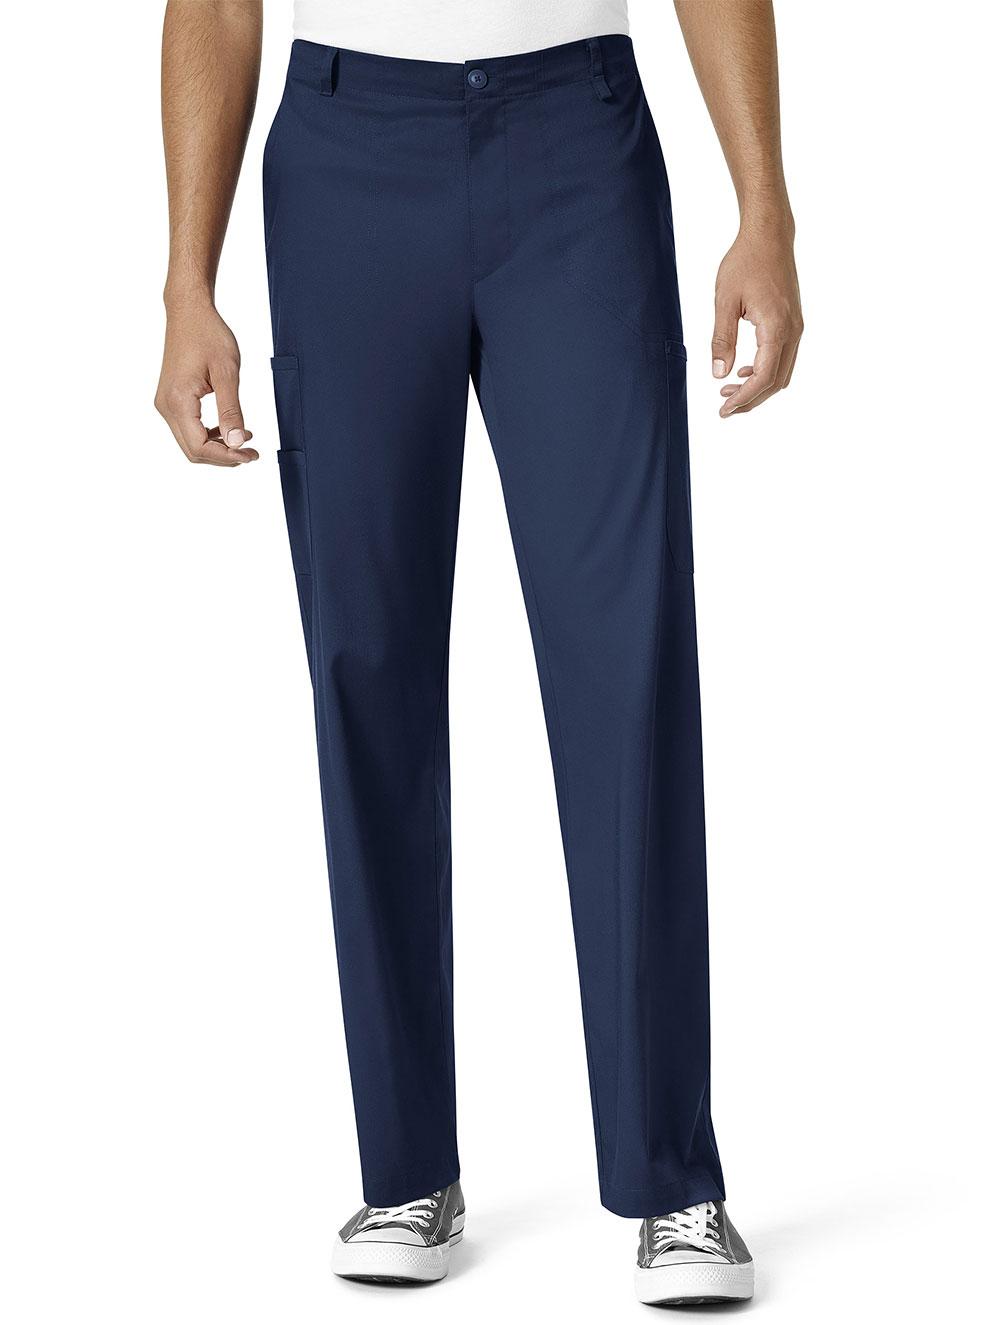 Men's Cargo Pant